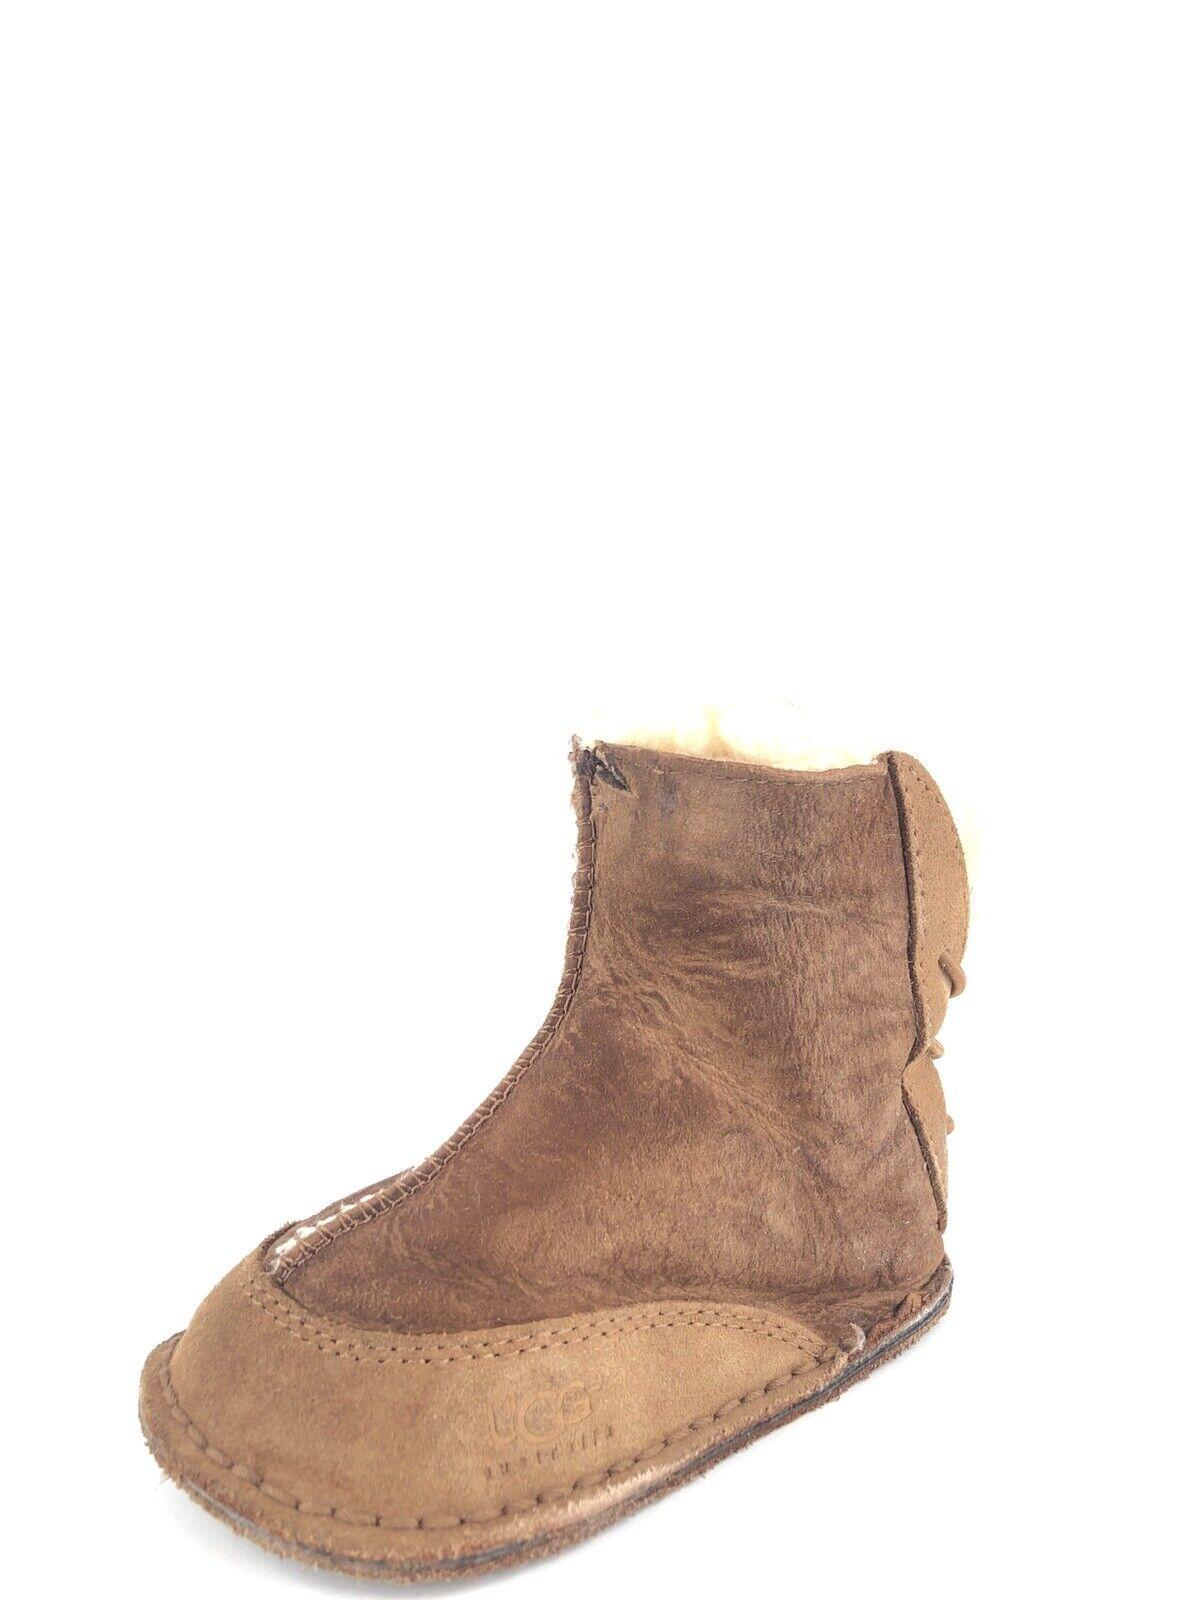 721a32b260d UGG Australia Baby Boo 5206 Medium Chestnut Sheepskin BOOTIES Size M *